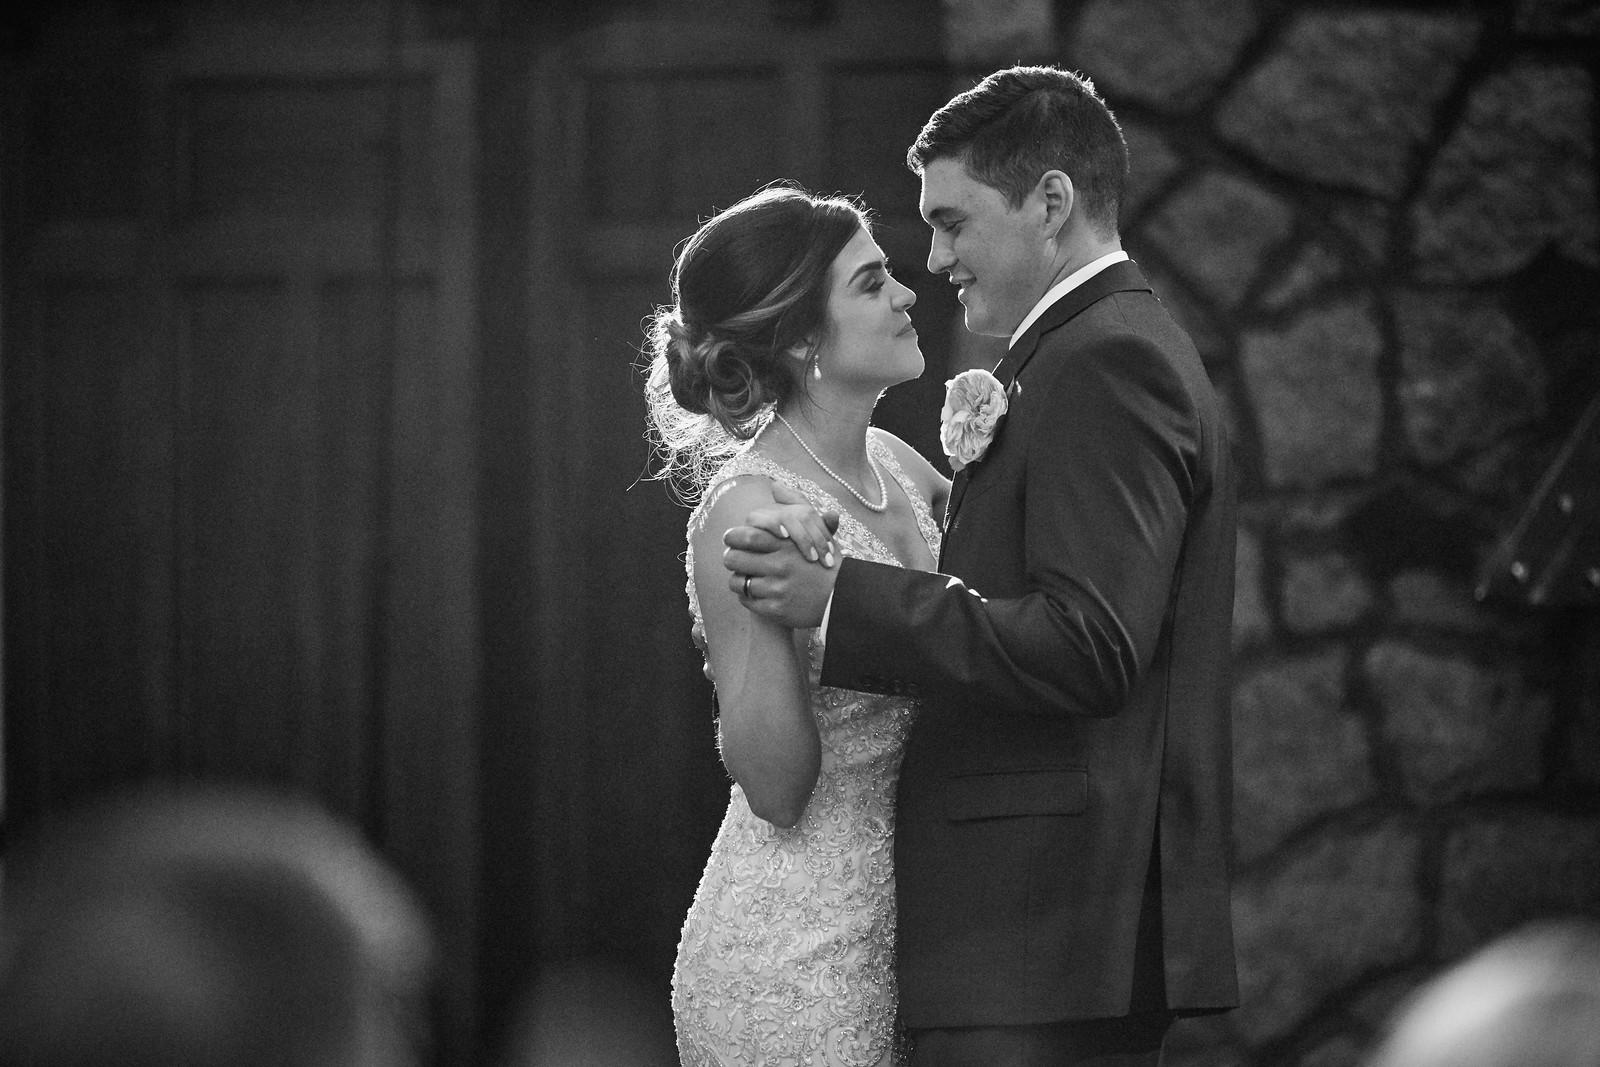 2017-04-22-Wedding-Driver-2017-X3.jpg